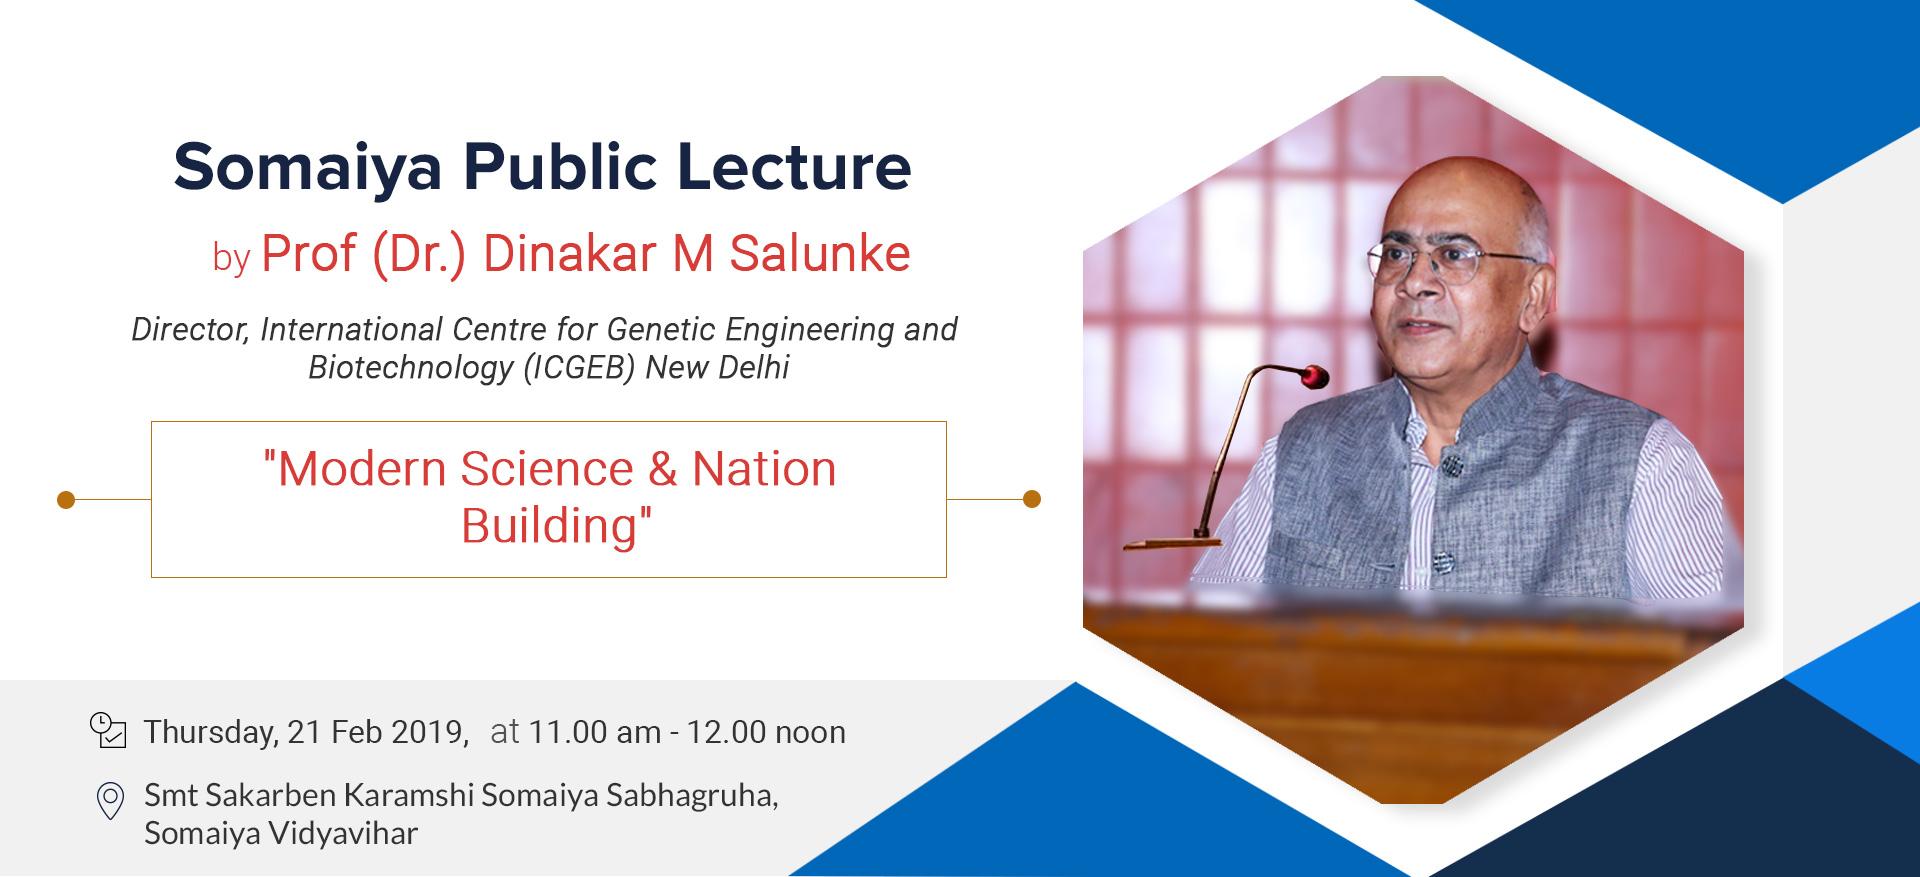 Somaiya Public Lecture